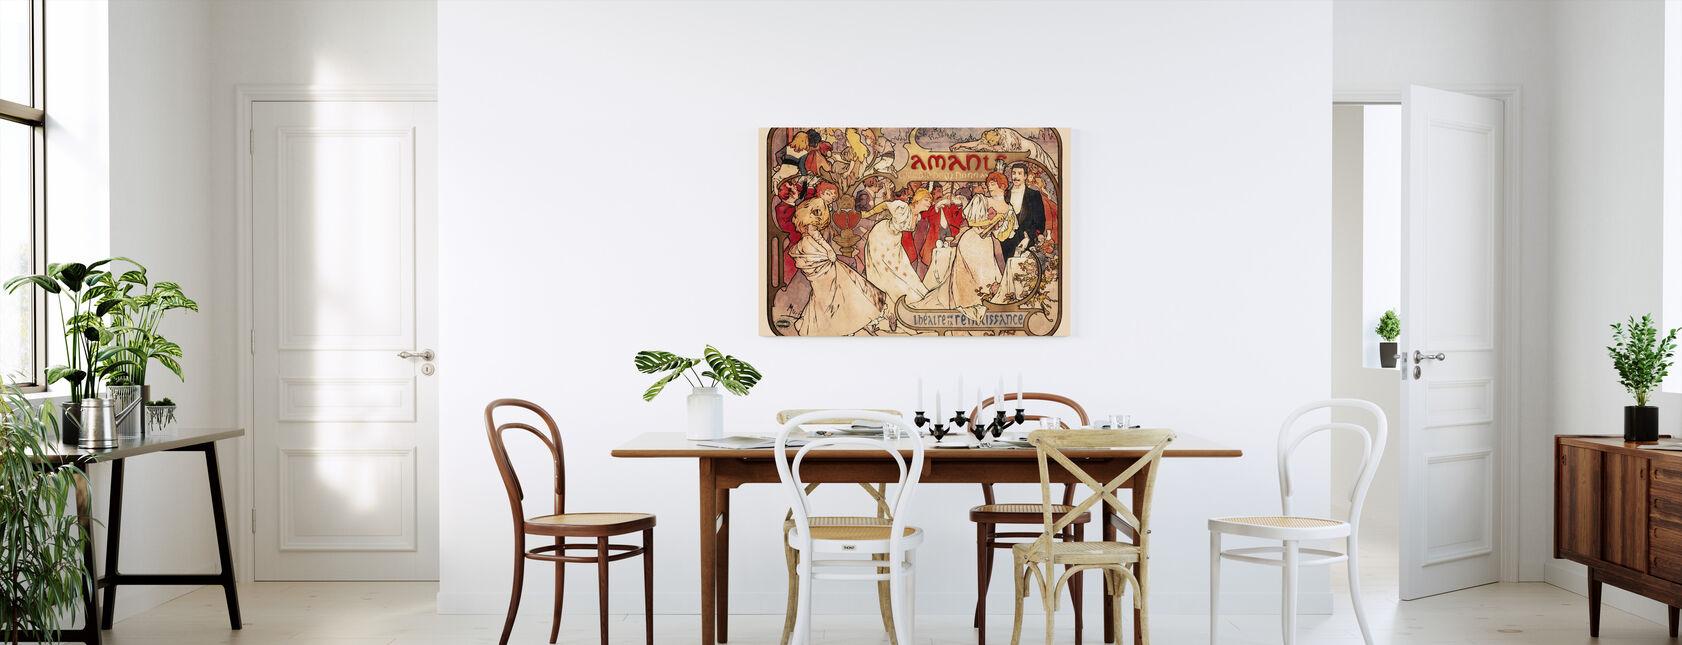 Alphonse Mucha - Amants Colour Litho - Canvas print - Kitchen